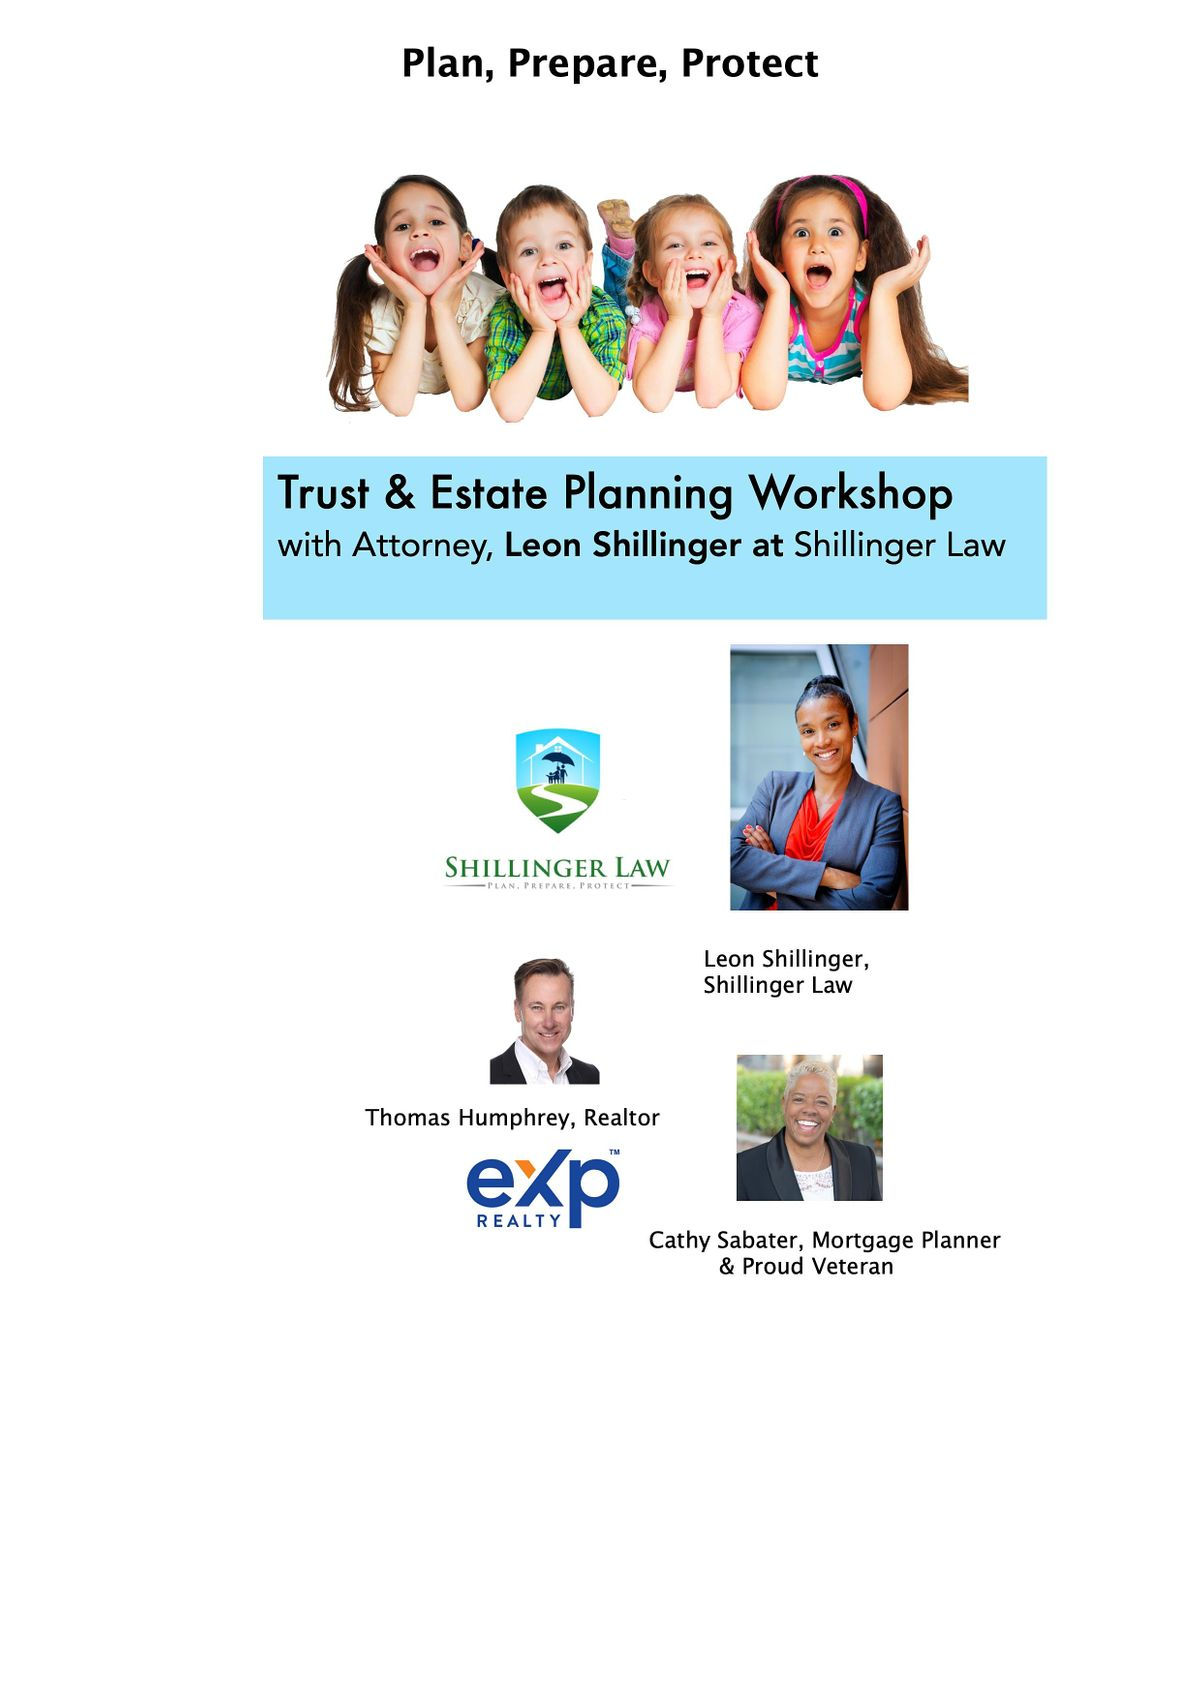 Trust & Estate Planning Workshop